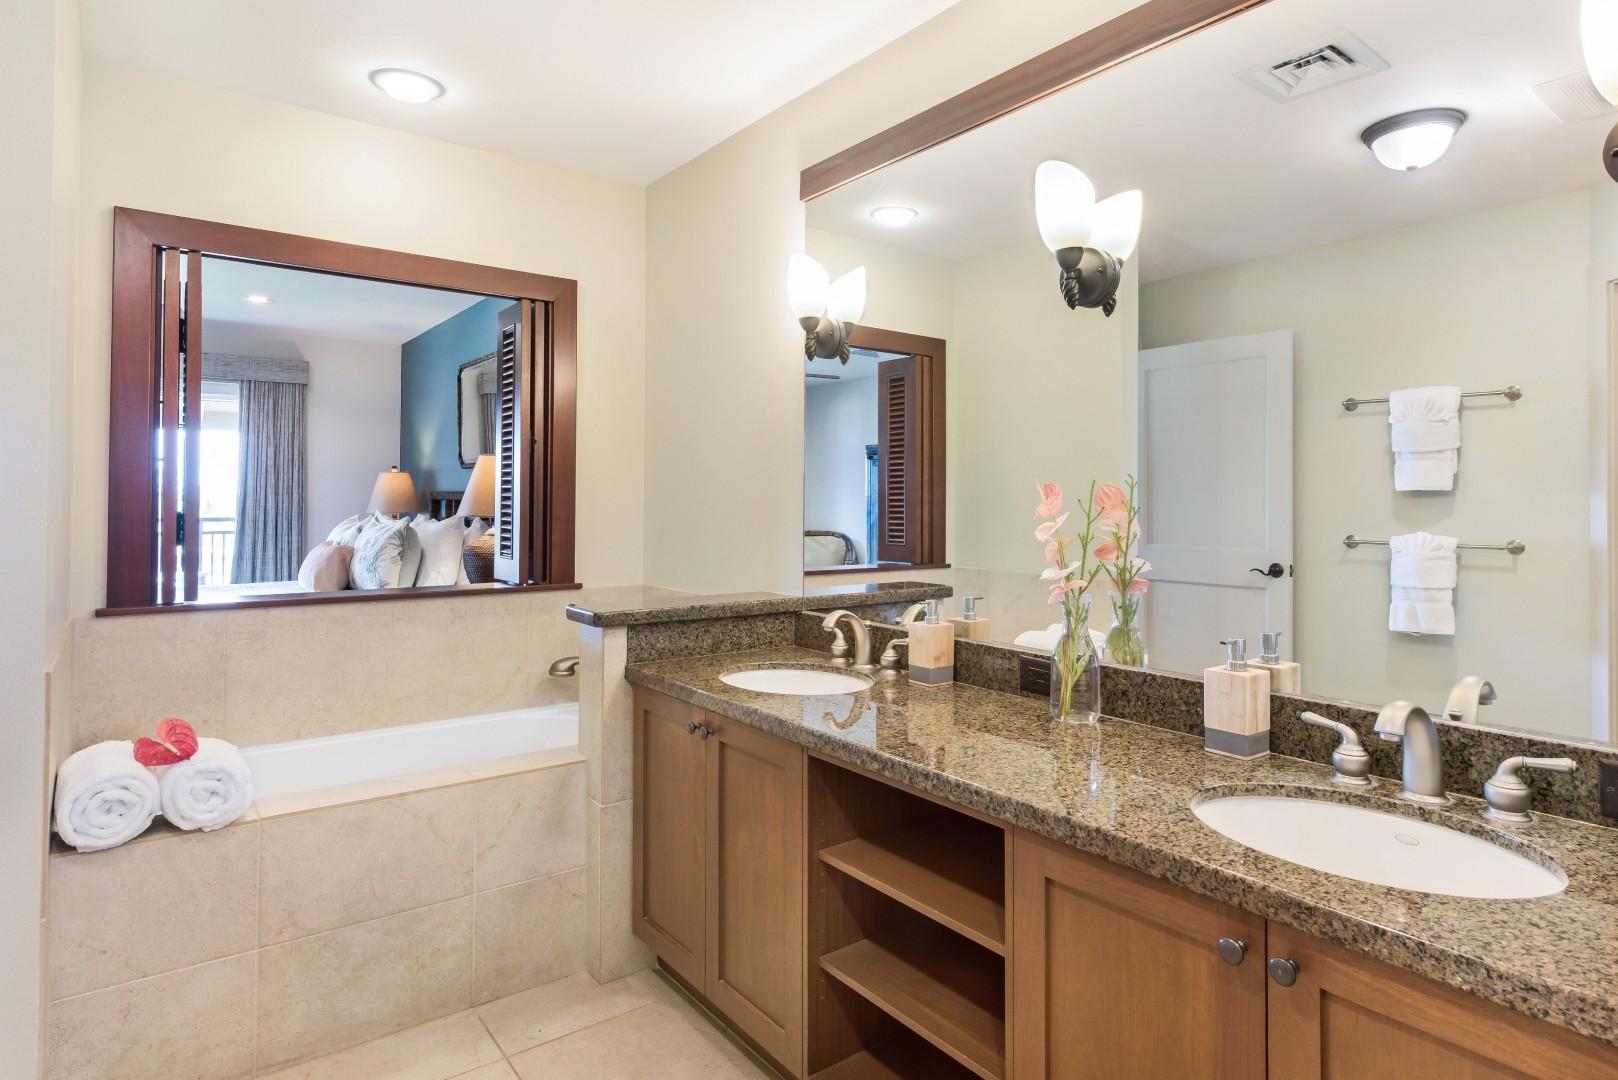 Master bath w/ dual sinks, soaking tub, ensuite to master bedroom